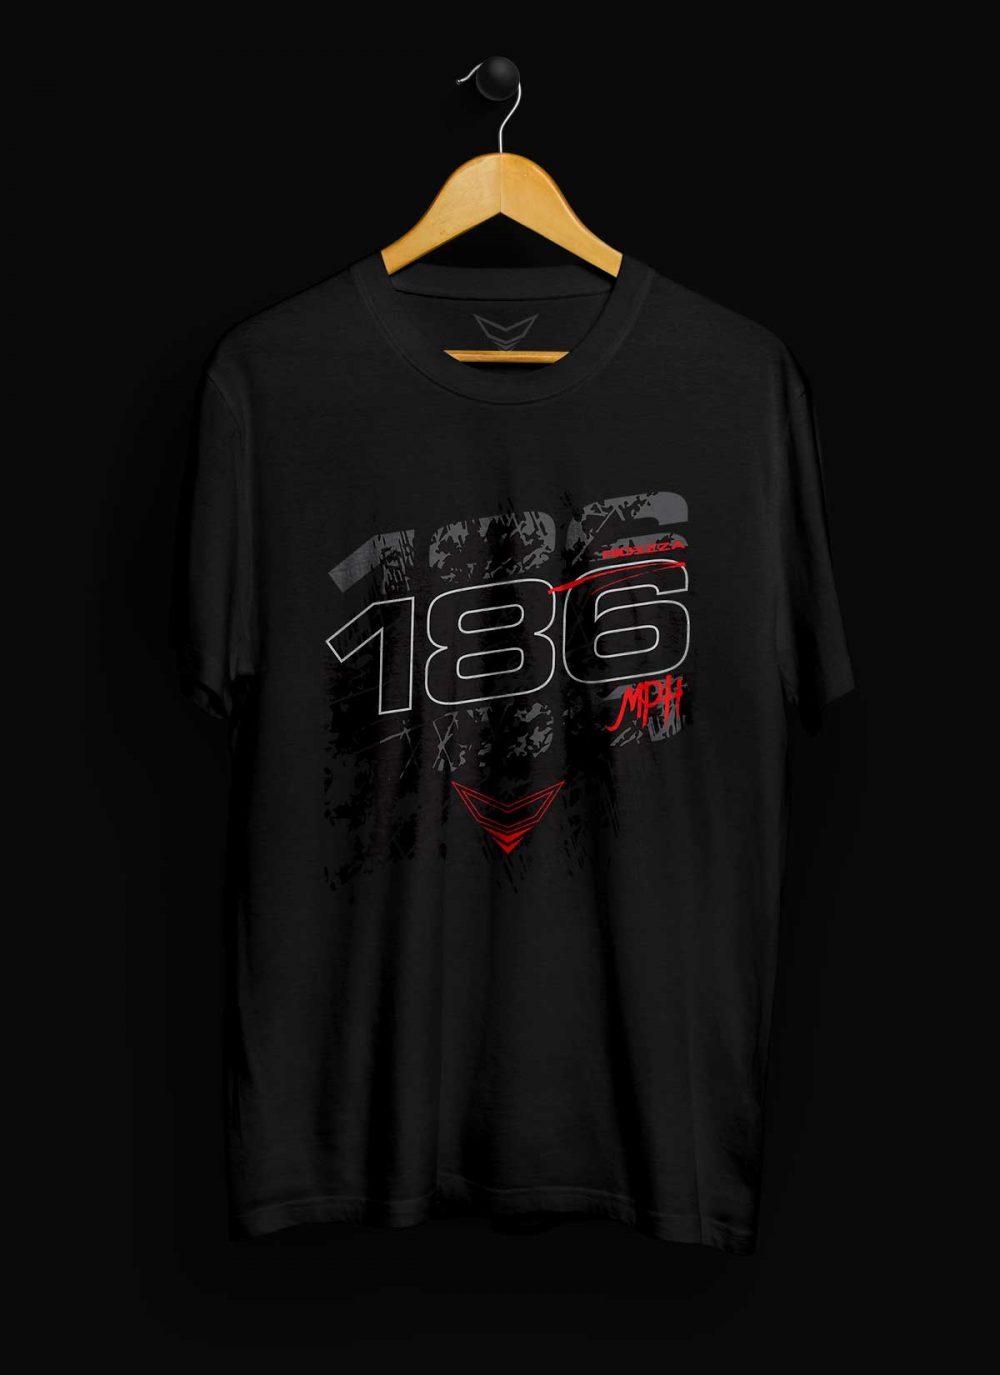 186MPH Motorcycle T-Shirt